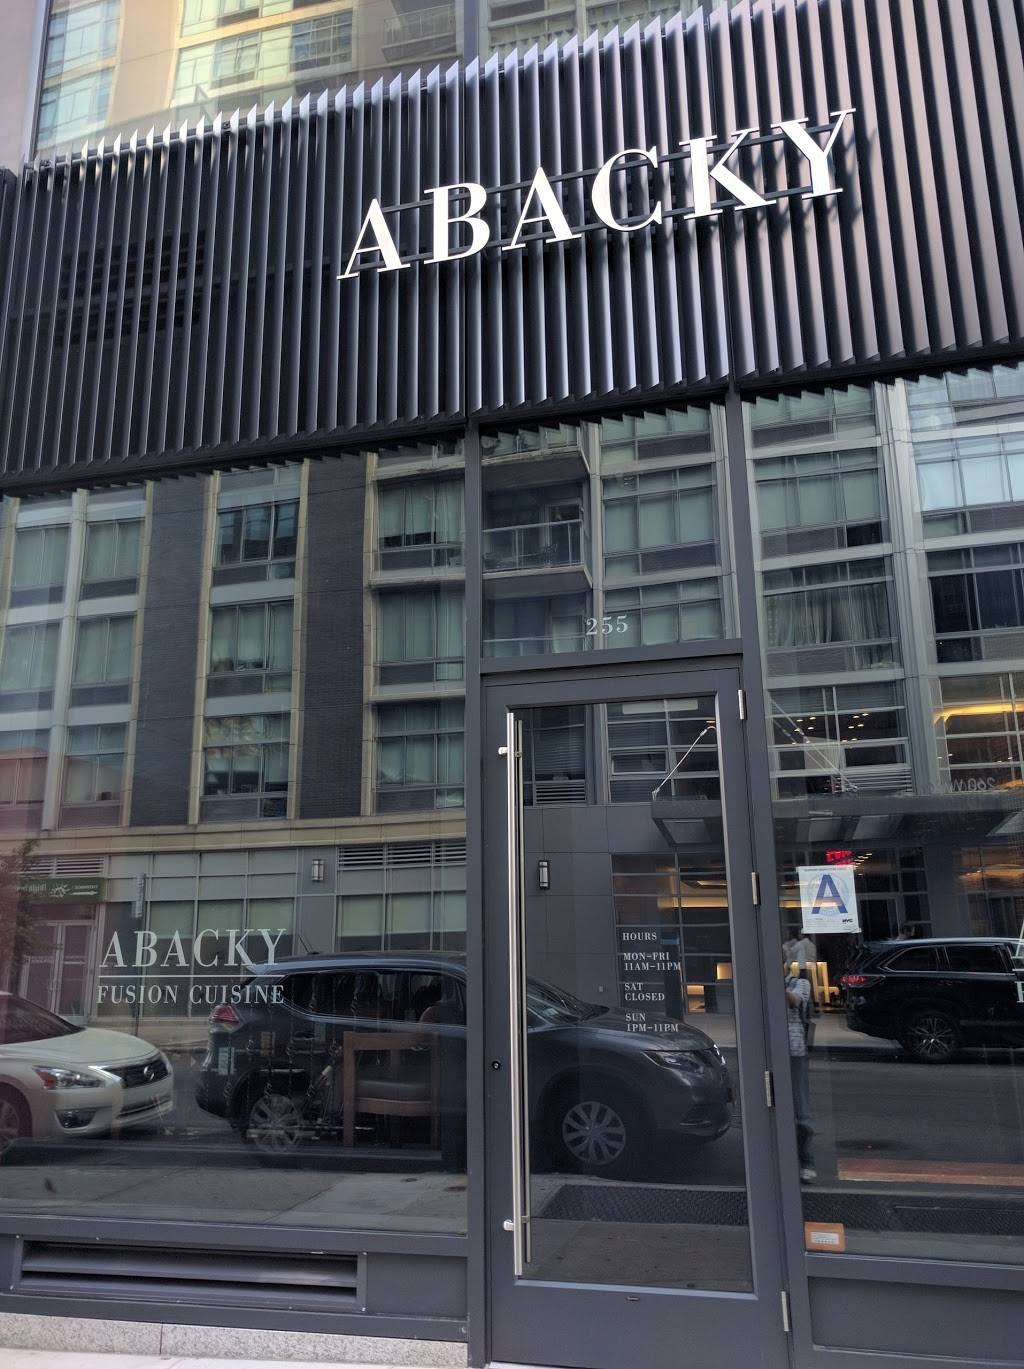 Abacky | restaurant | 255 W 26th St, New York, NY 10001, USA | 2129293848 OR +1 212-929-3848